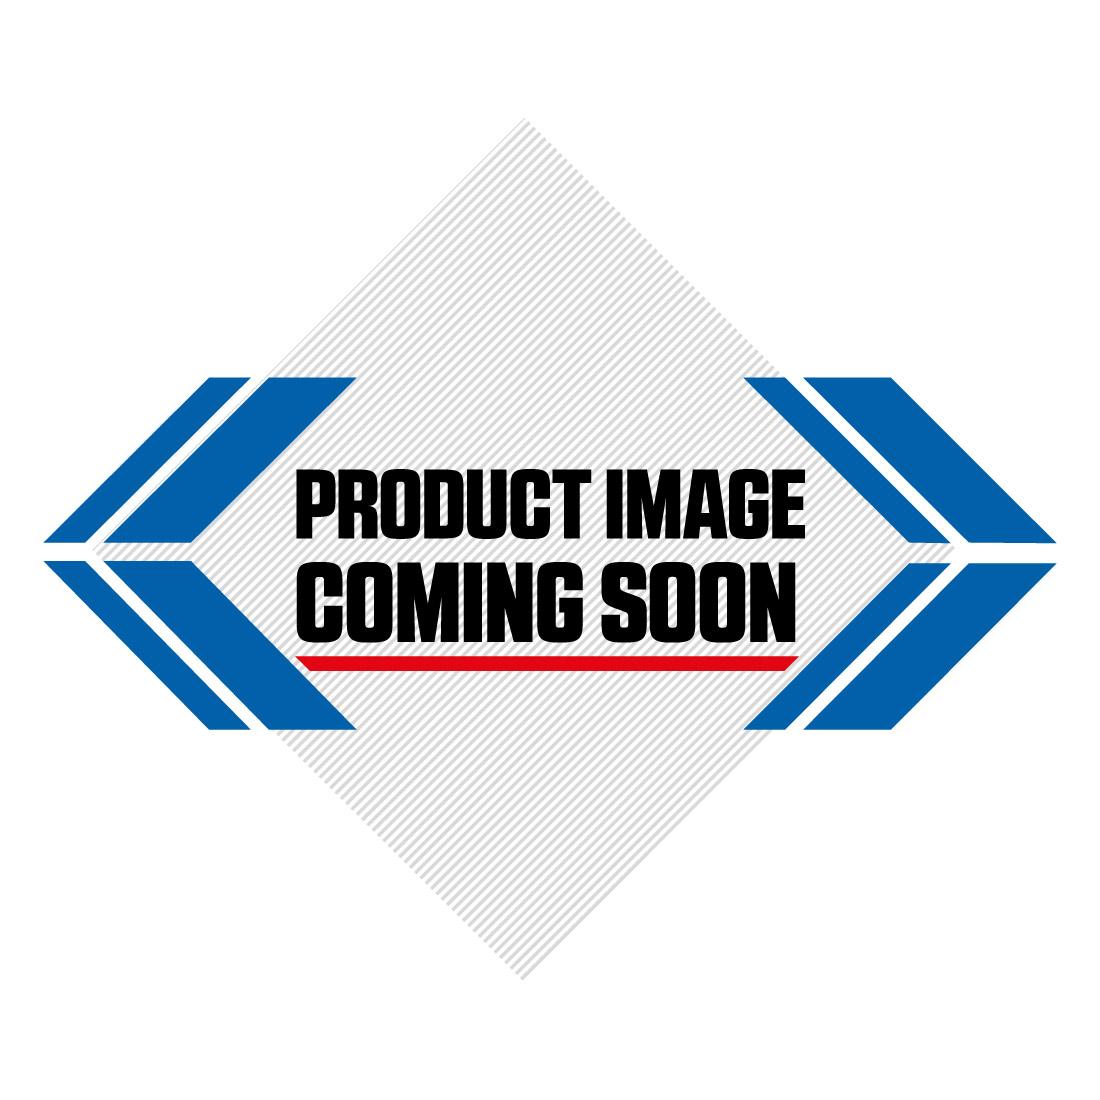 Sidi Crossfire 3 SRS Motocross Boots - TC222 Cairoli LTD Edition Image-2>